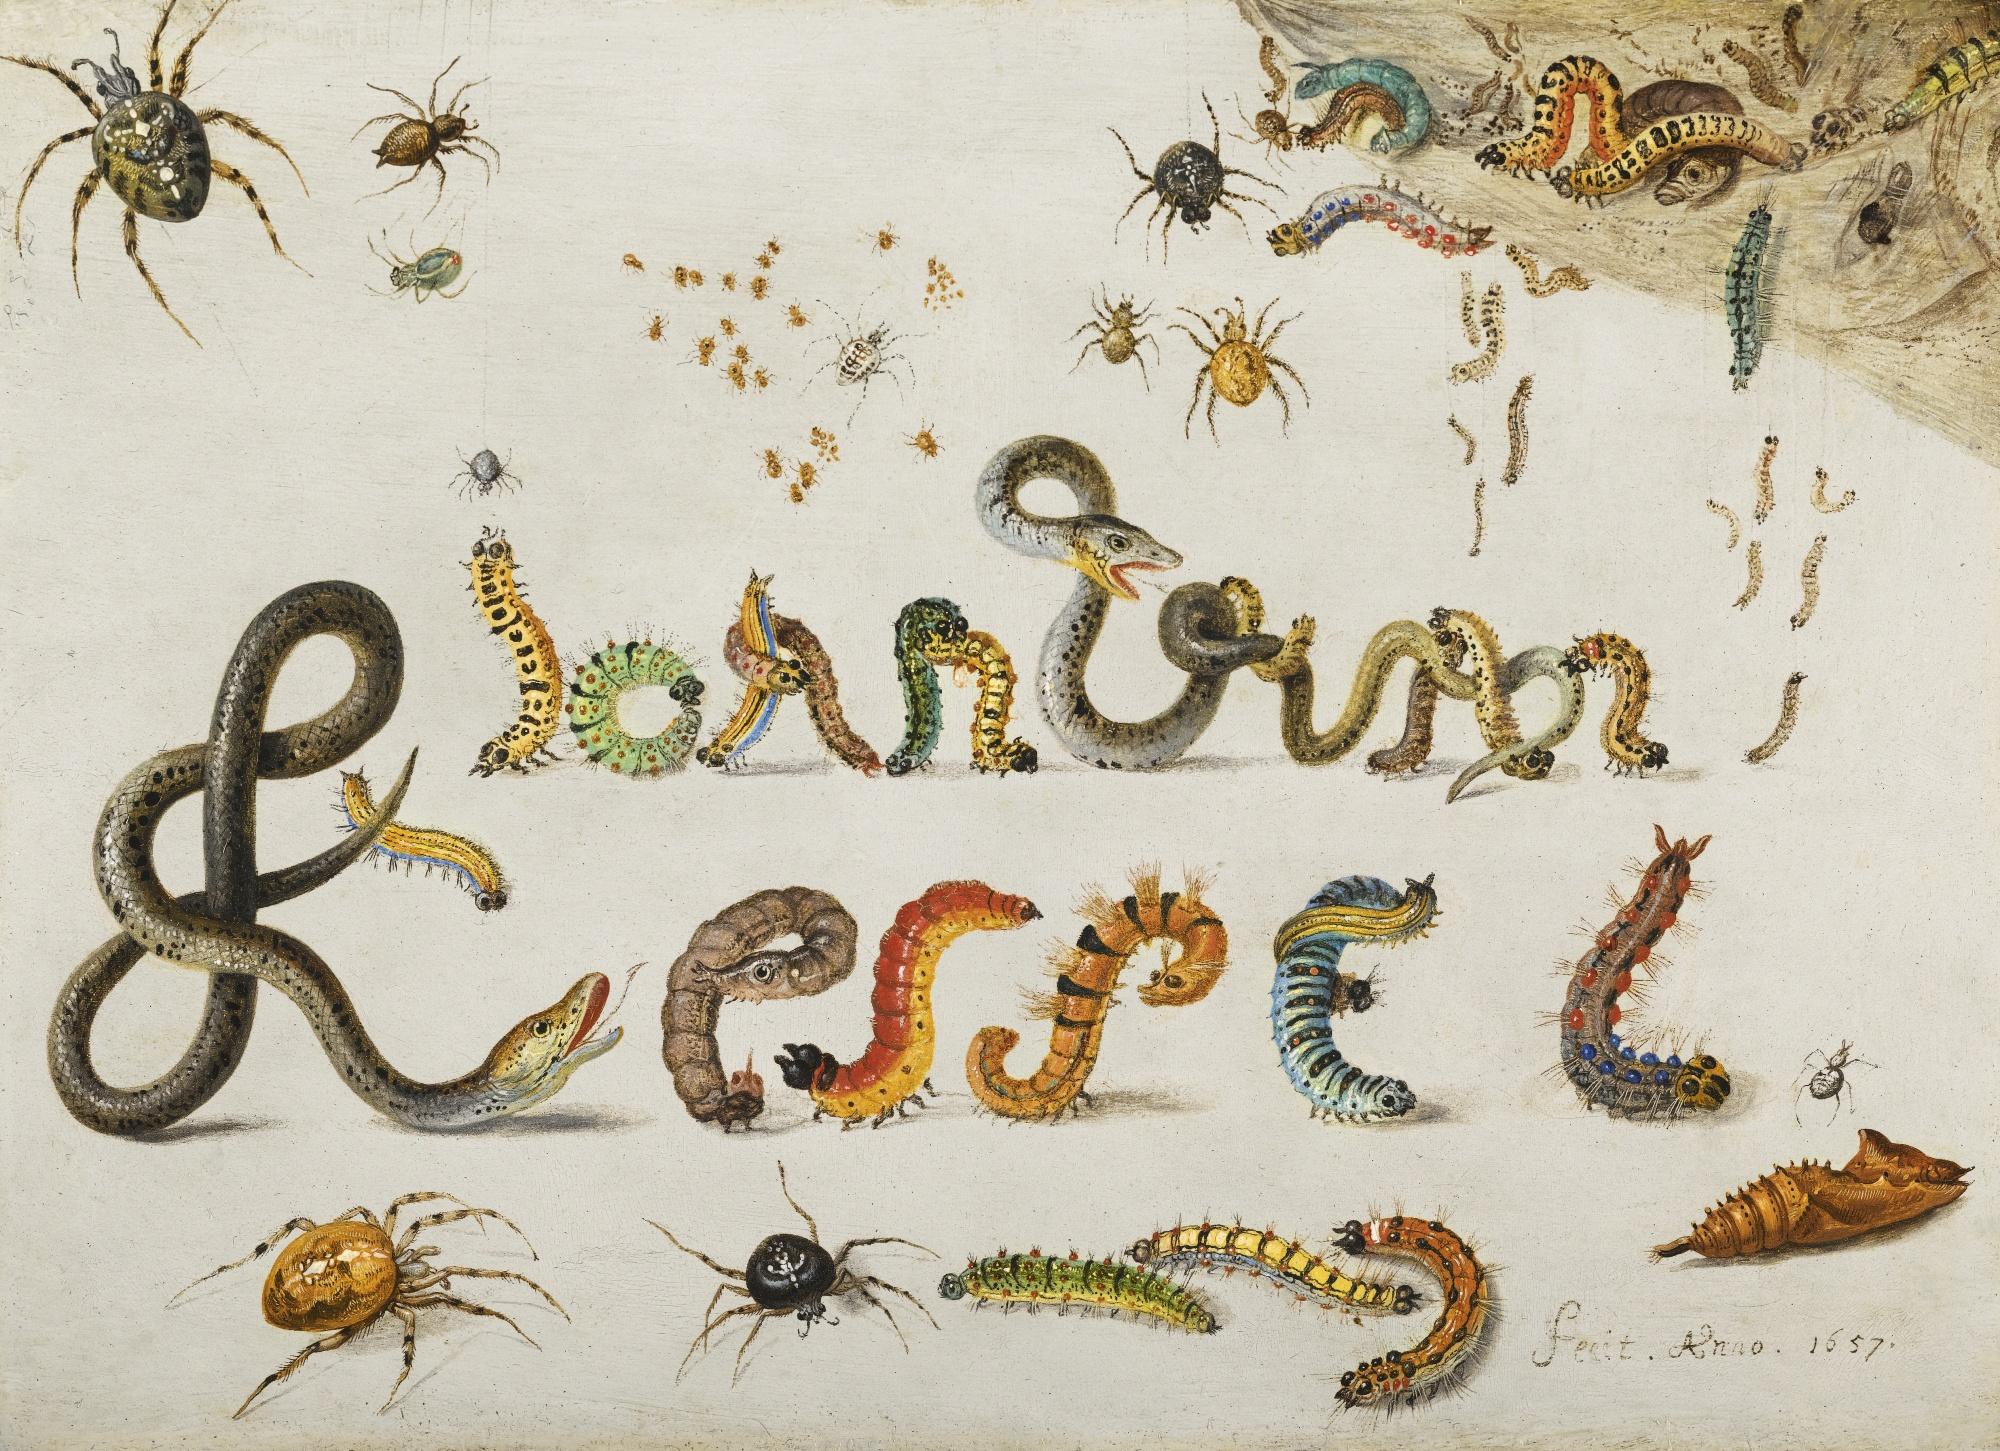 Jan van Kessel's Signature of Caterpillars and Snakes (1657)